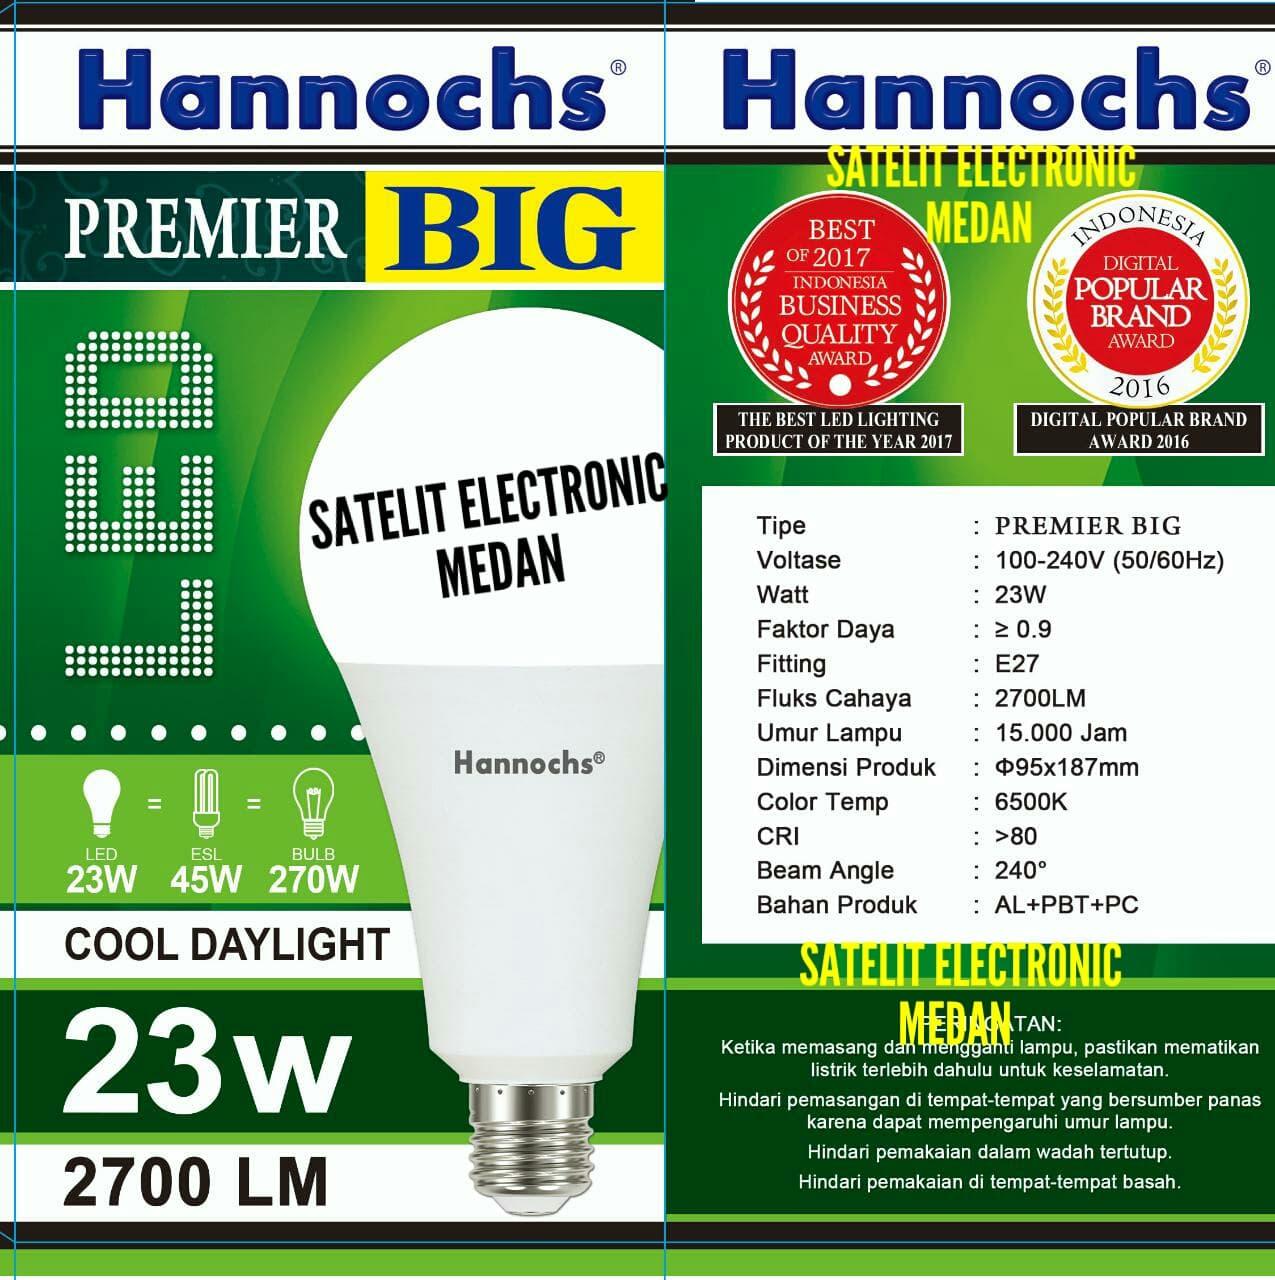 Jual Lampu Led Hannochs Premier Big 23 W Watt Bergaransi 3 Hemat Satelit Electronic Tokopedia